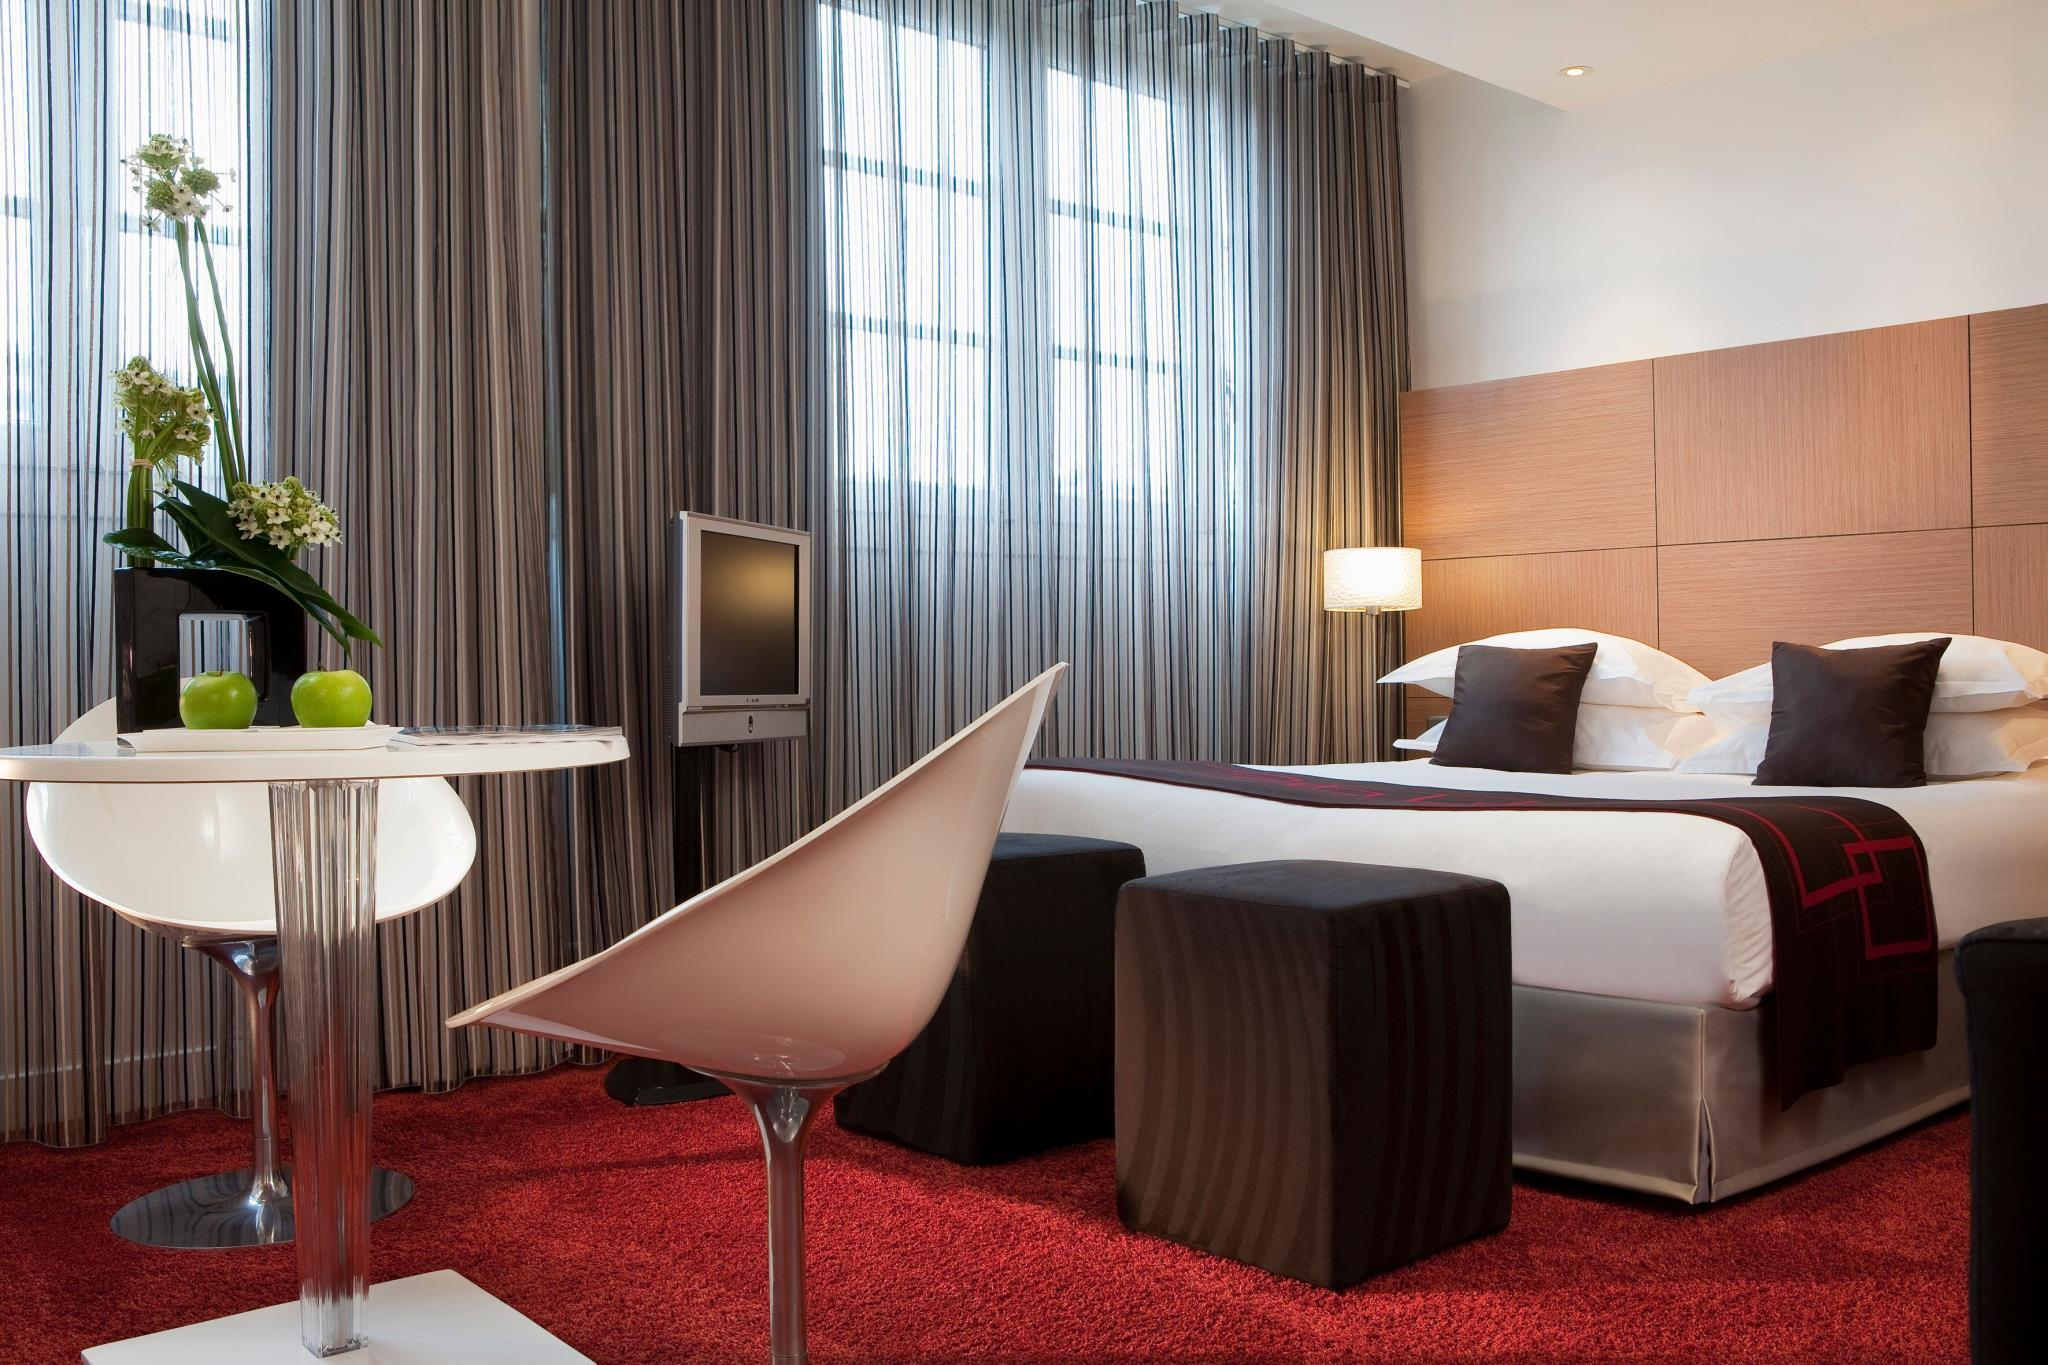 Villathena in Paris - Room Deals, Photos & Reviews